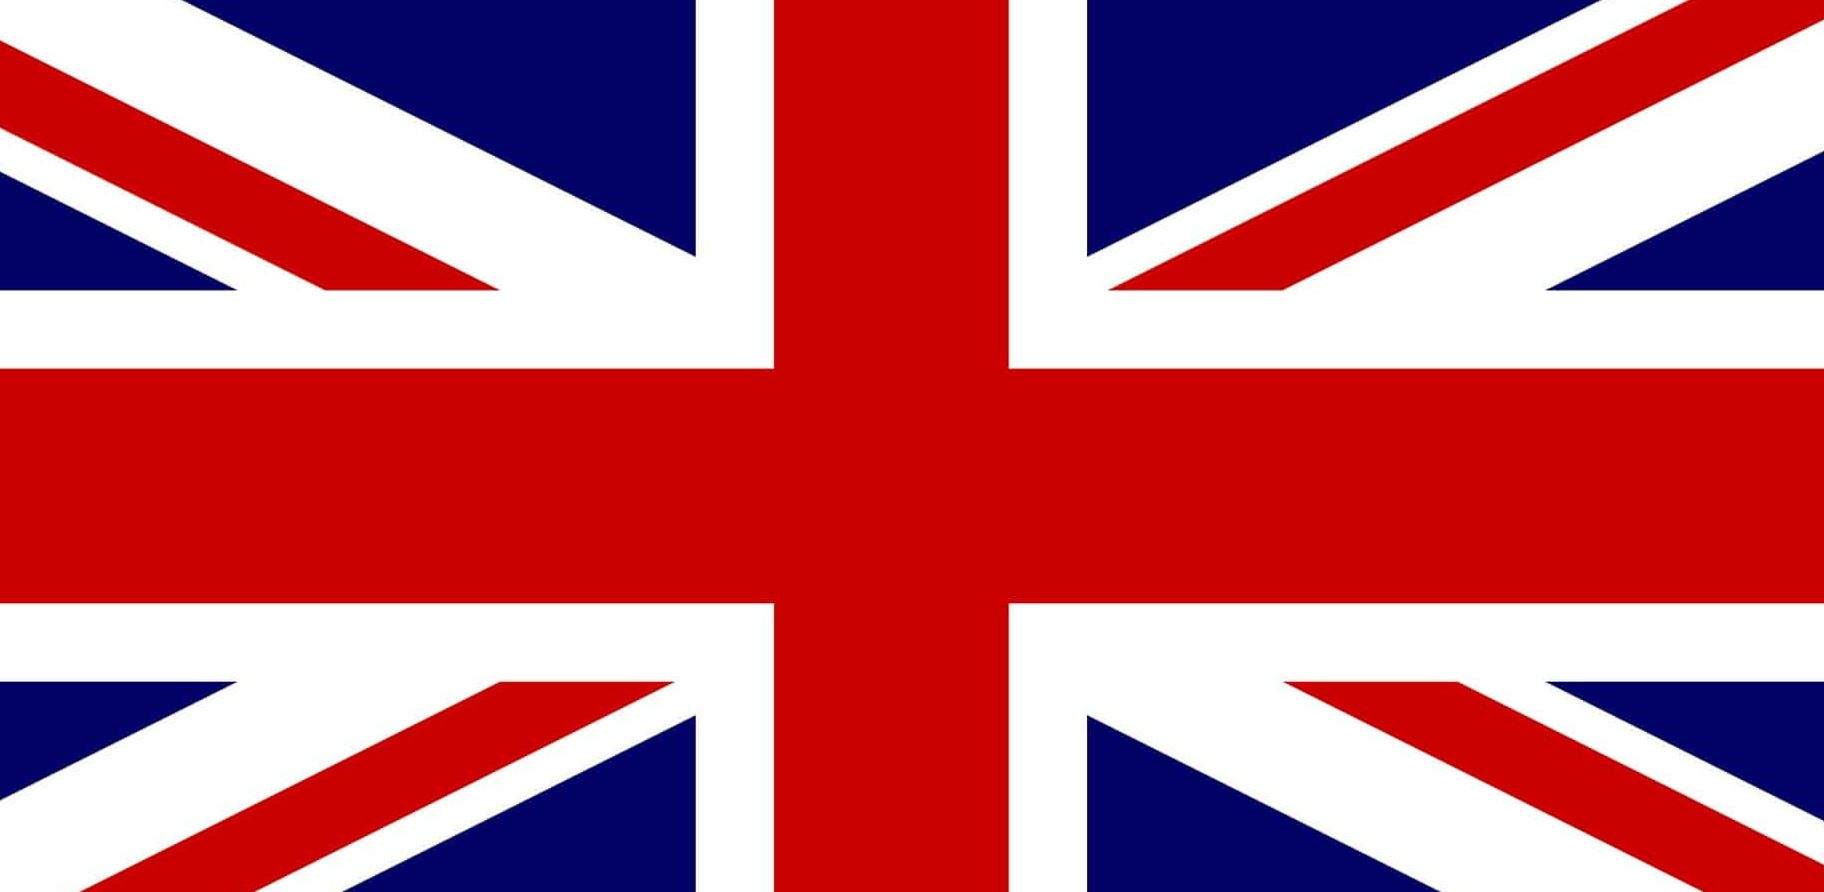 How To Watch Montenegro Vs England Free On Uk Tv